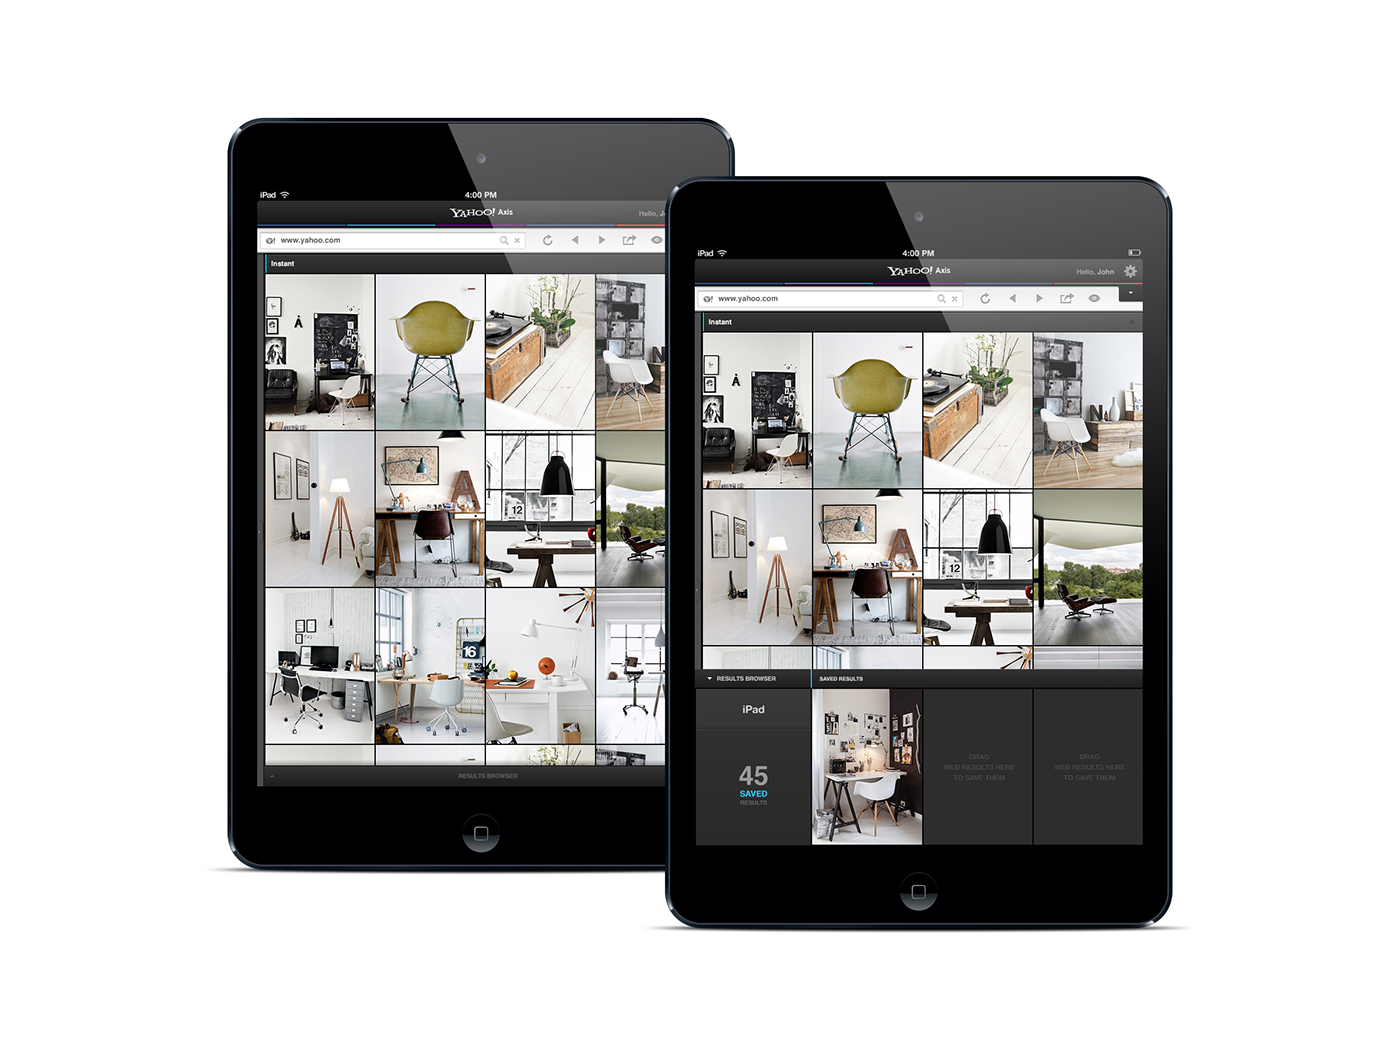 iPad application